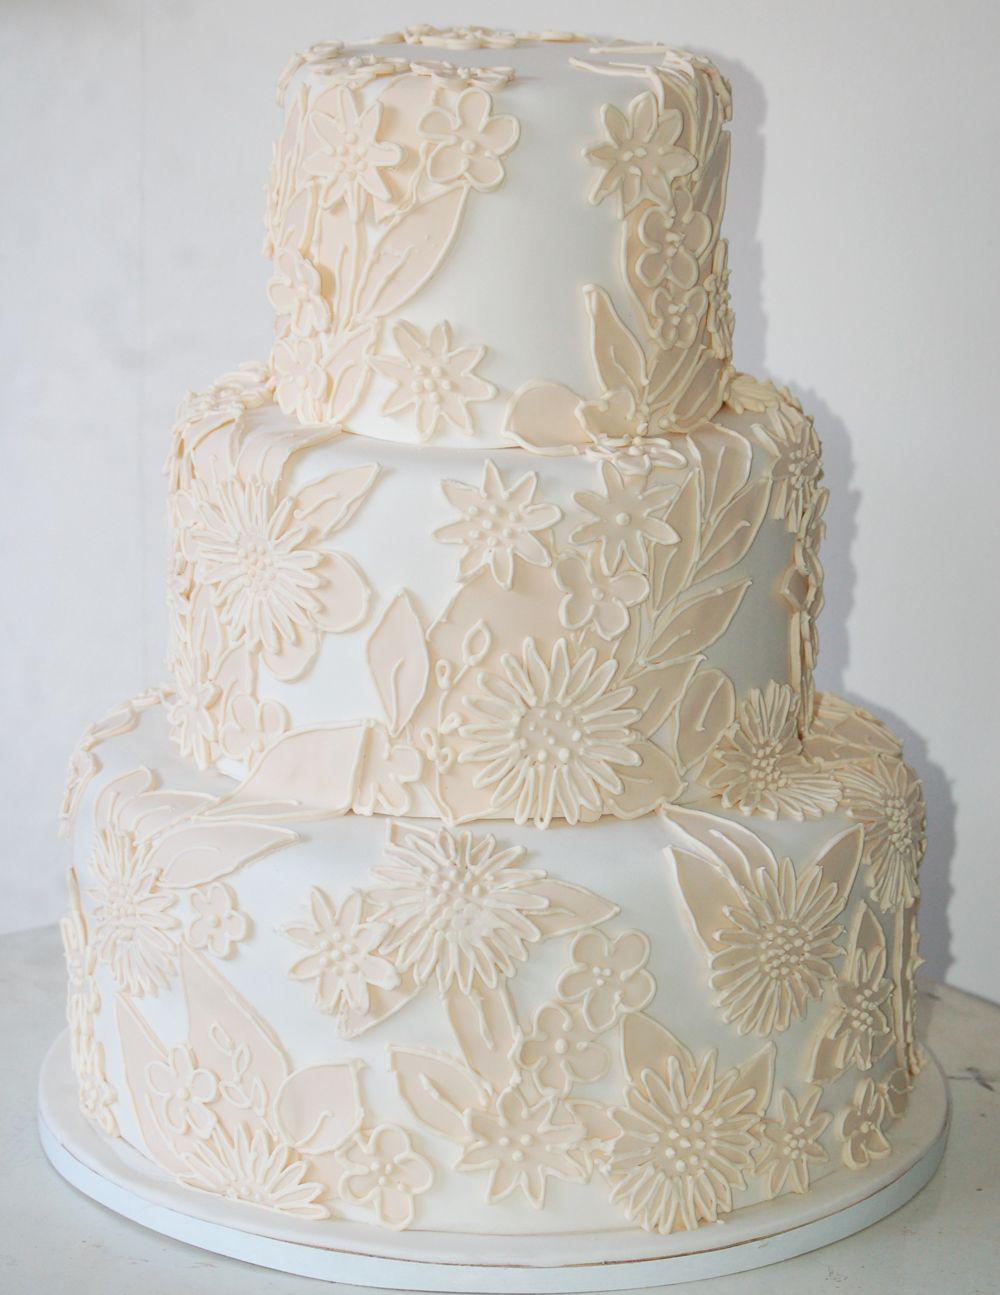 bali wedding cakes | deweddingjpg.com